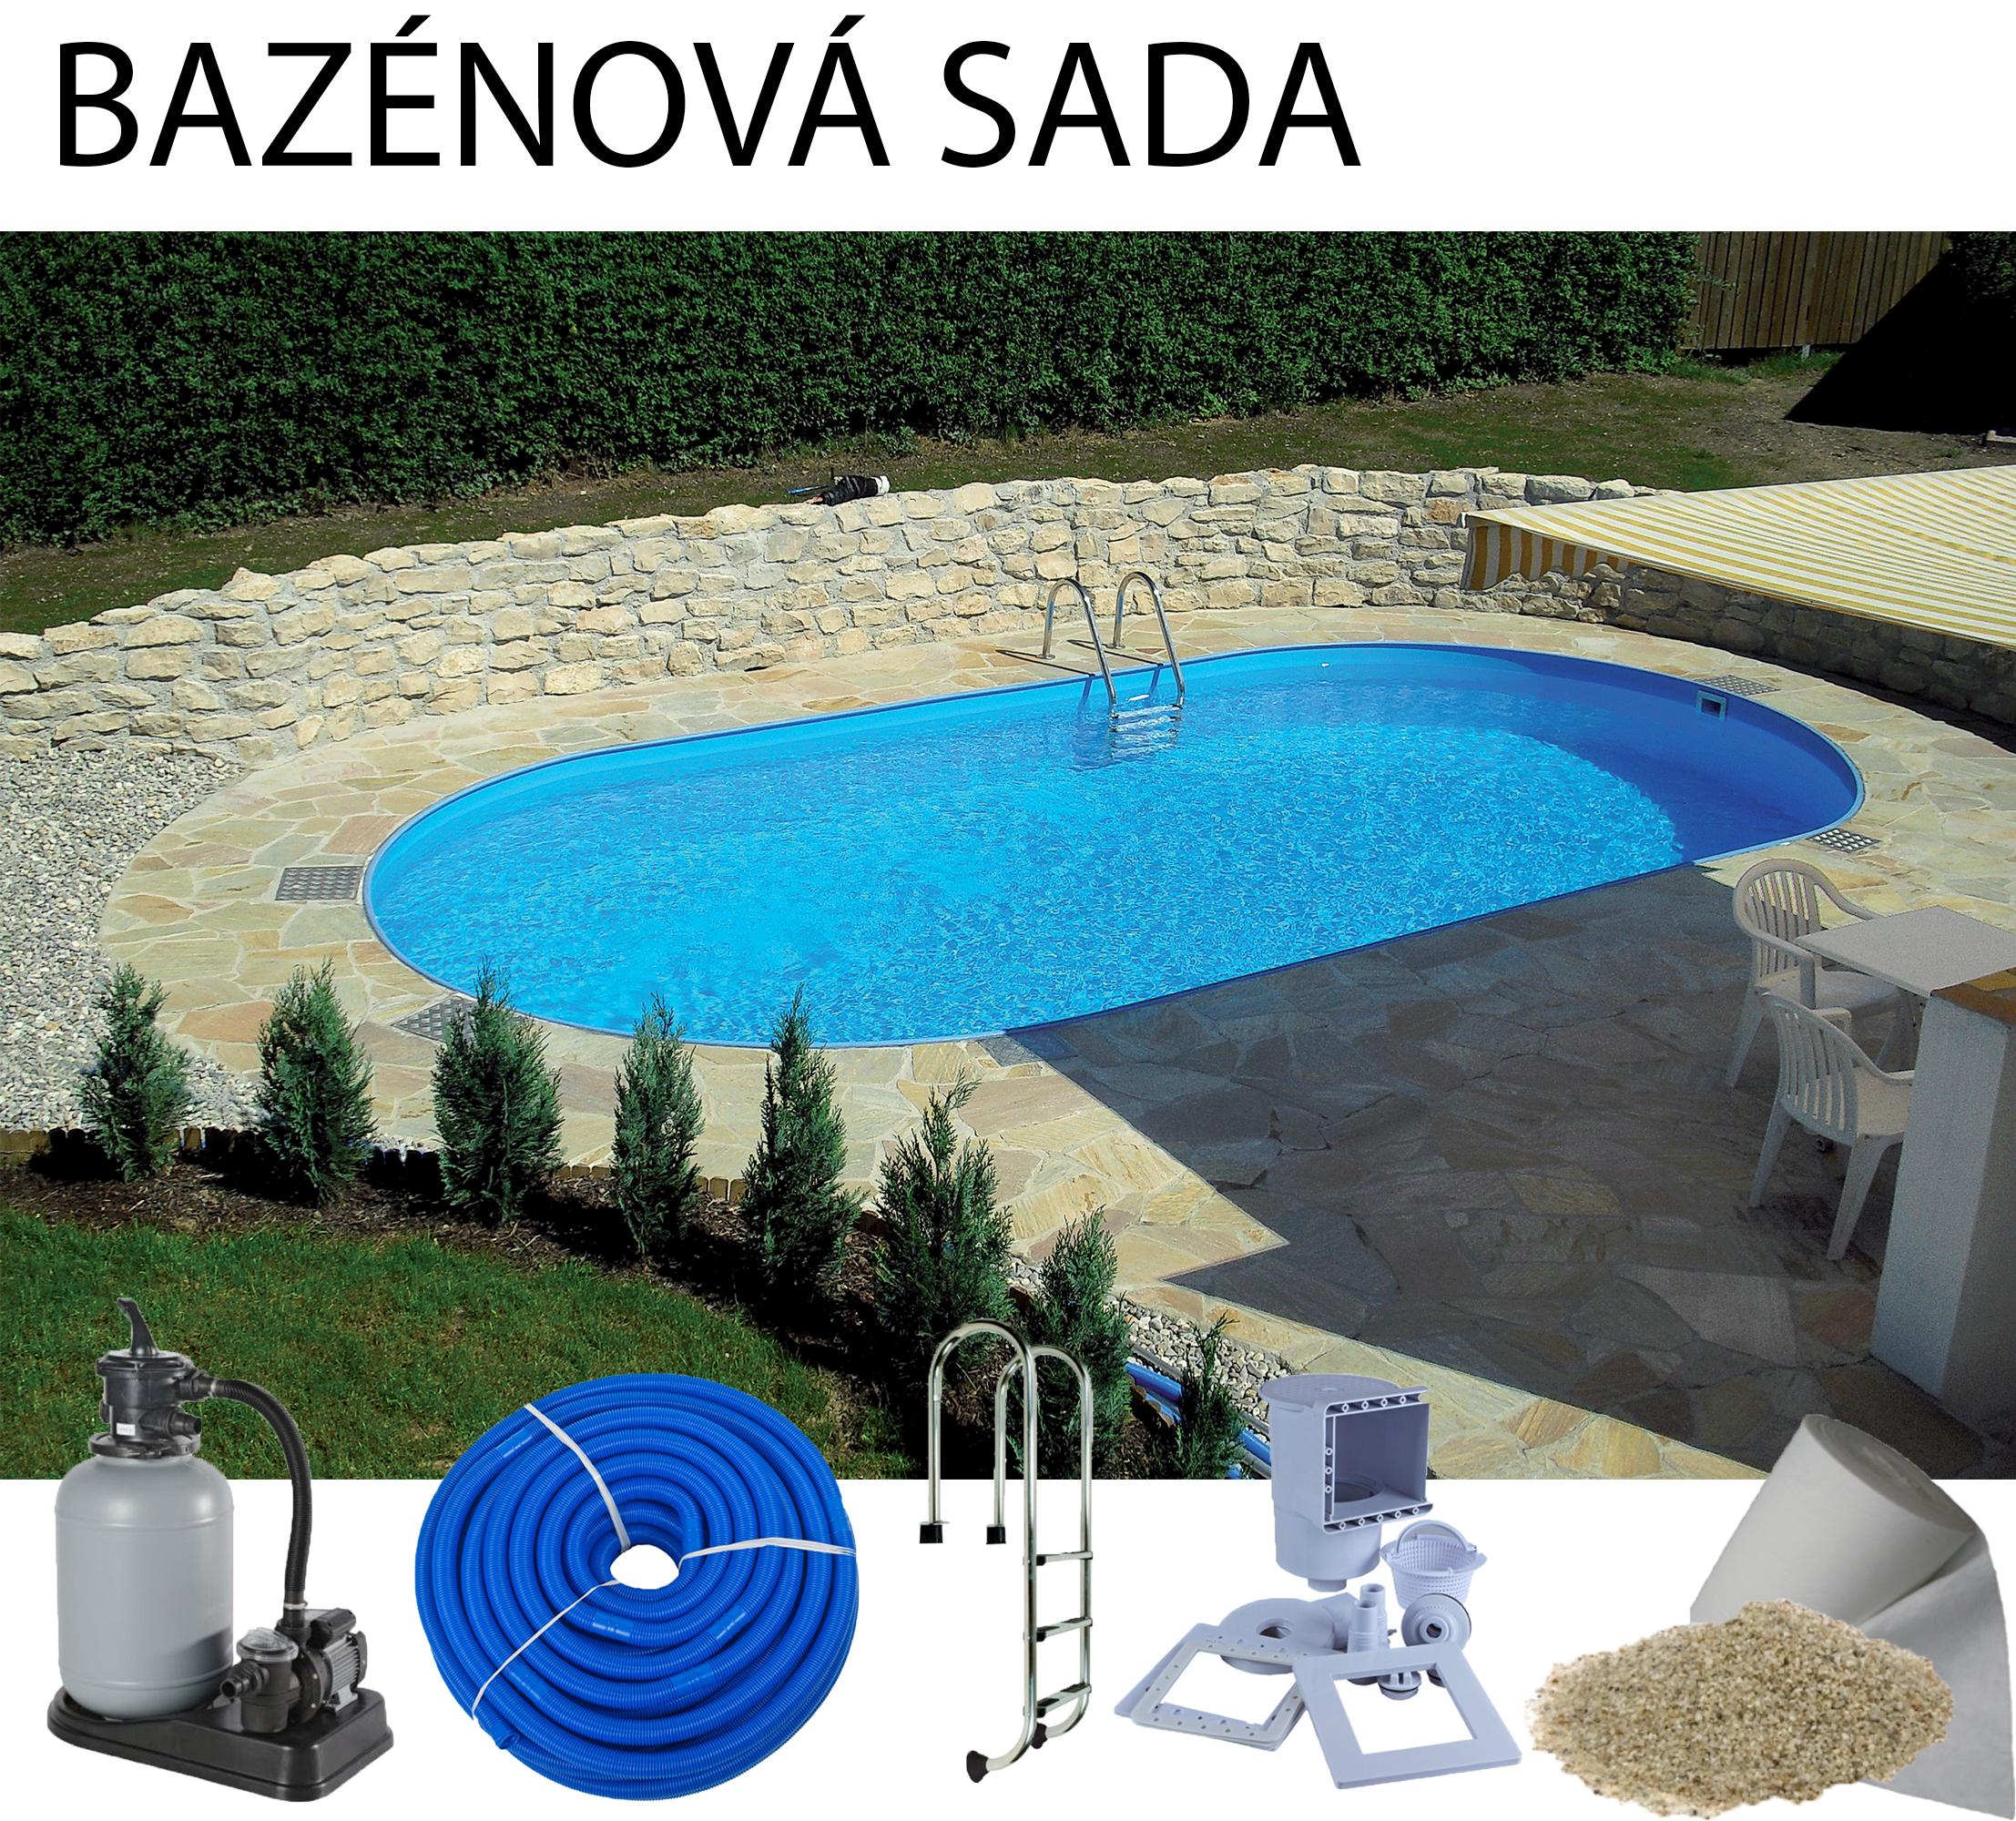 Hobbypool Toscana 900 Zapustený Oválny Bazén 9 X 5 X 15 M